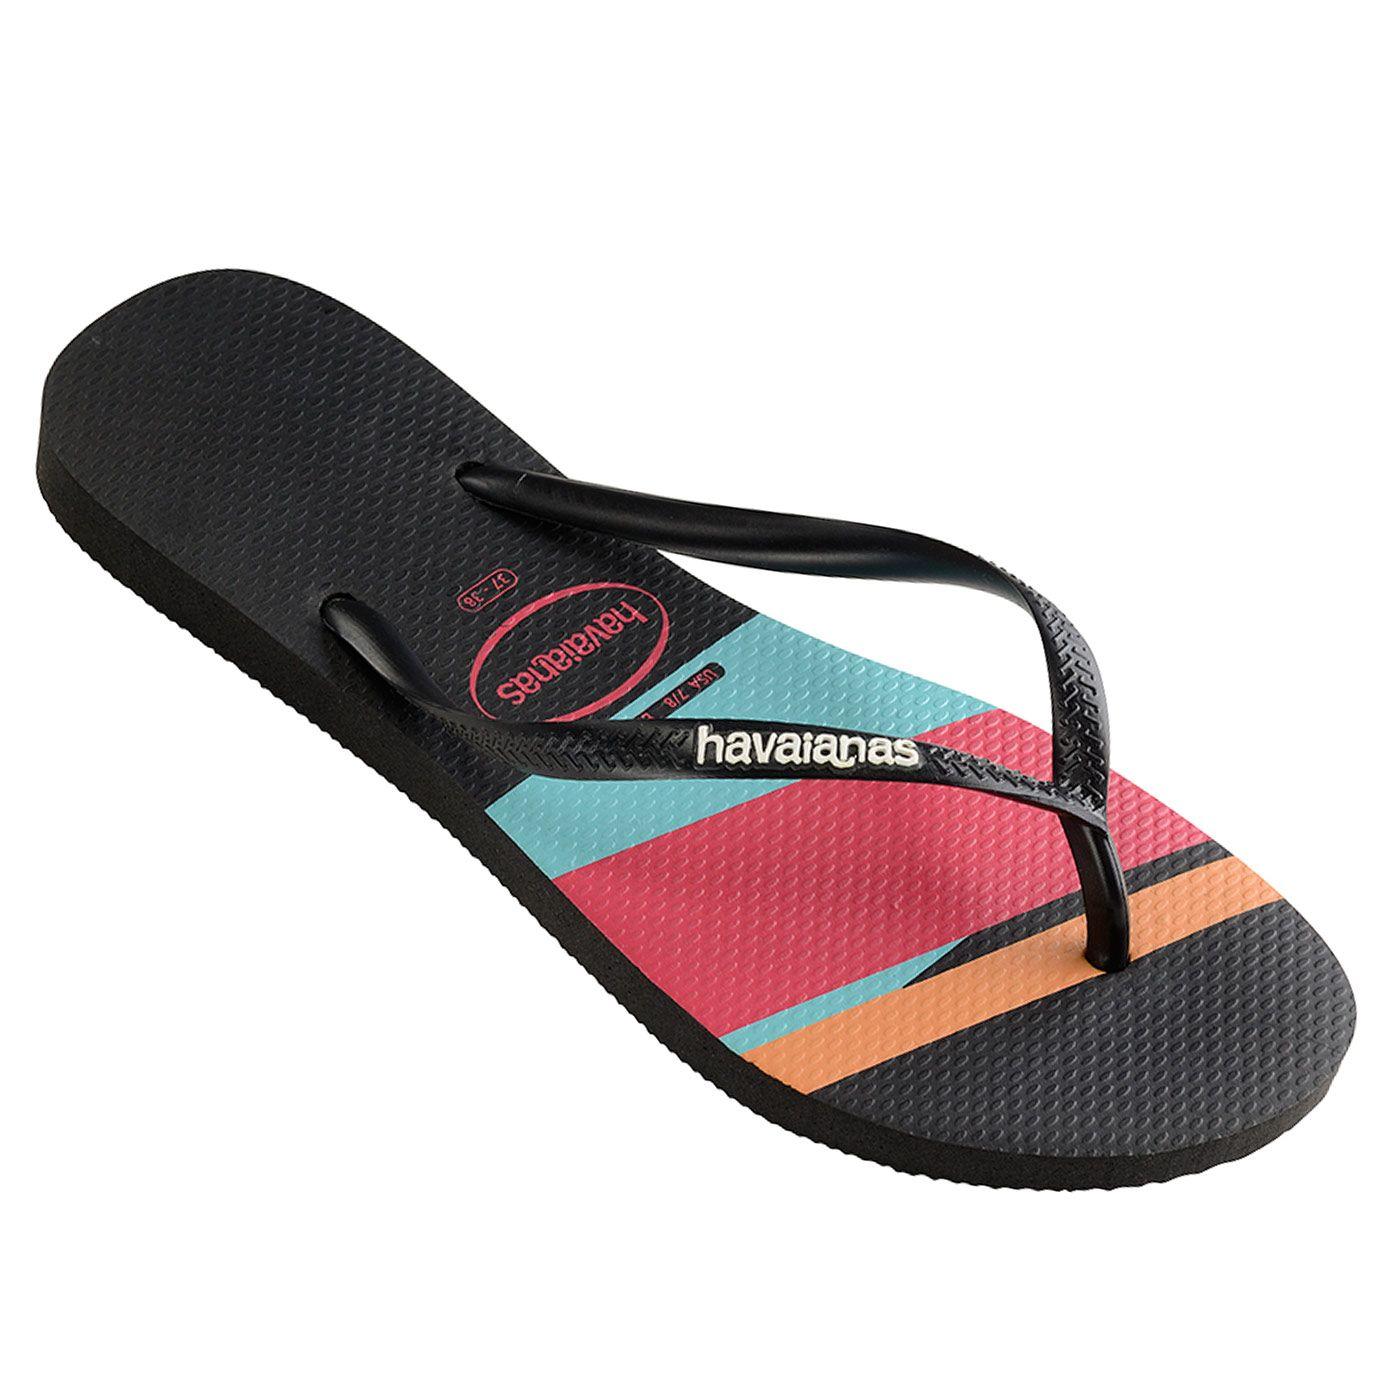 83597f441c30 Havaianas Slim Stripes (Block) Black Colour Thongs. Rock the block this  summer